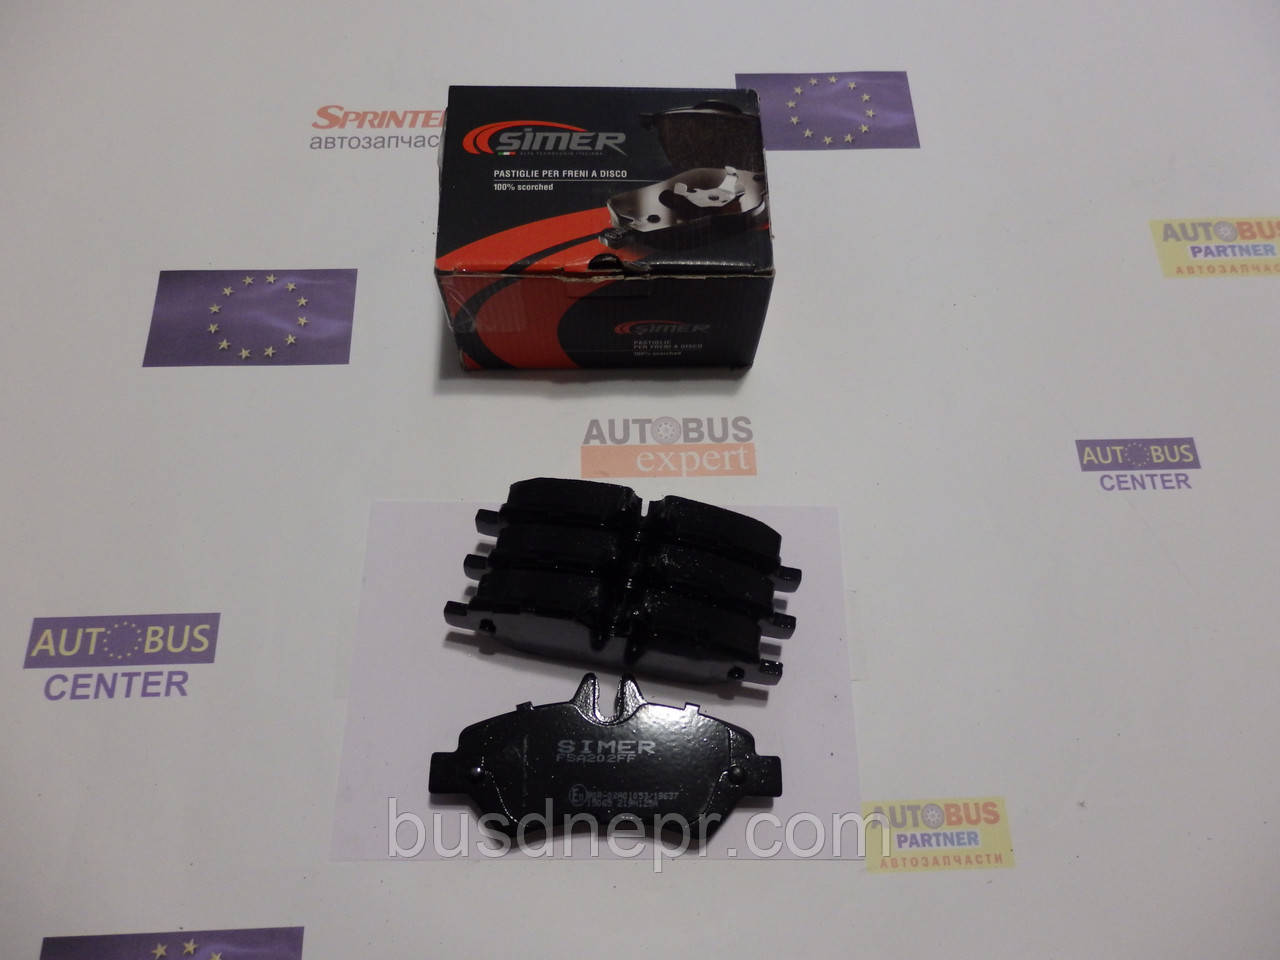 Тормозные колодки, задние (не спарка), MB Sprinter, VW Crafter 06- SIMER SI963